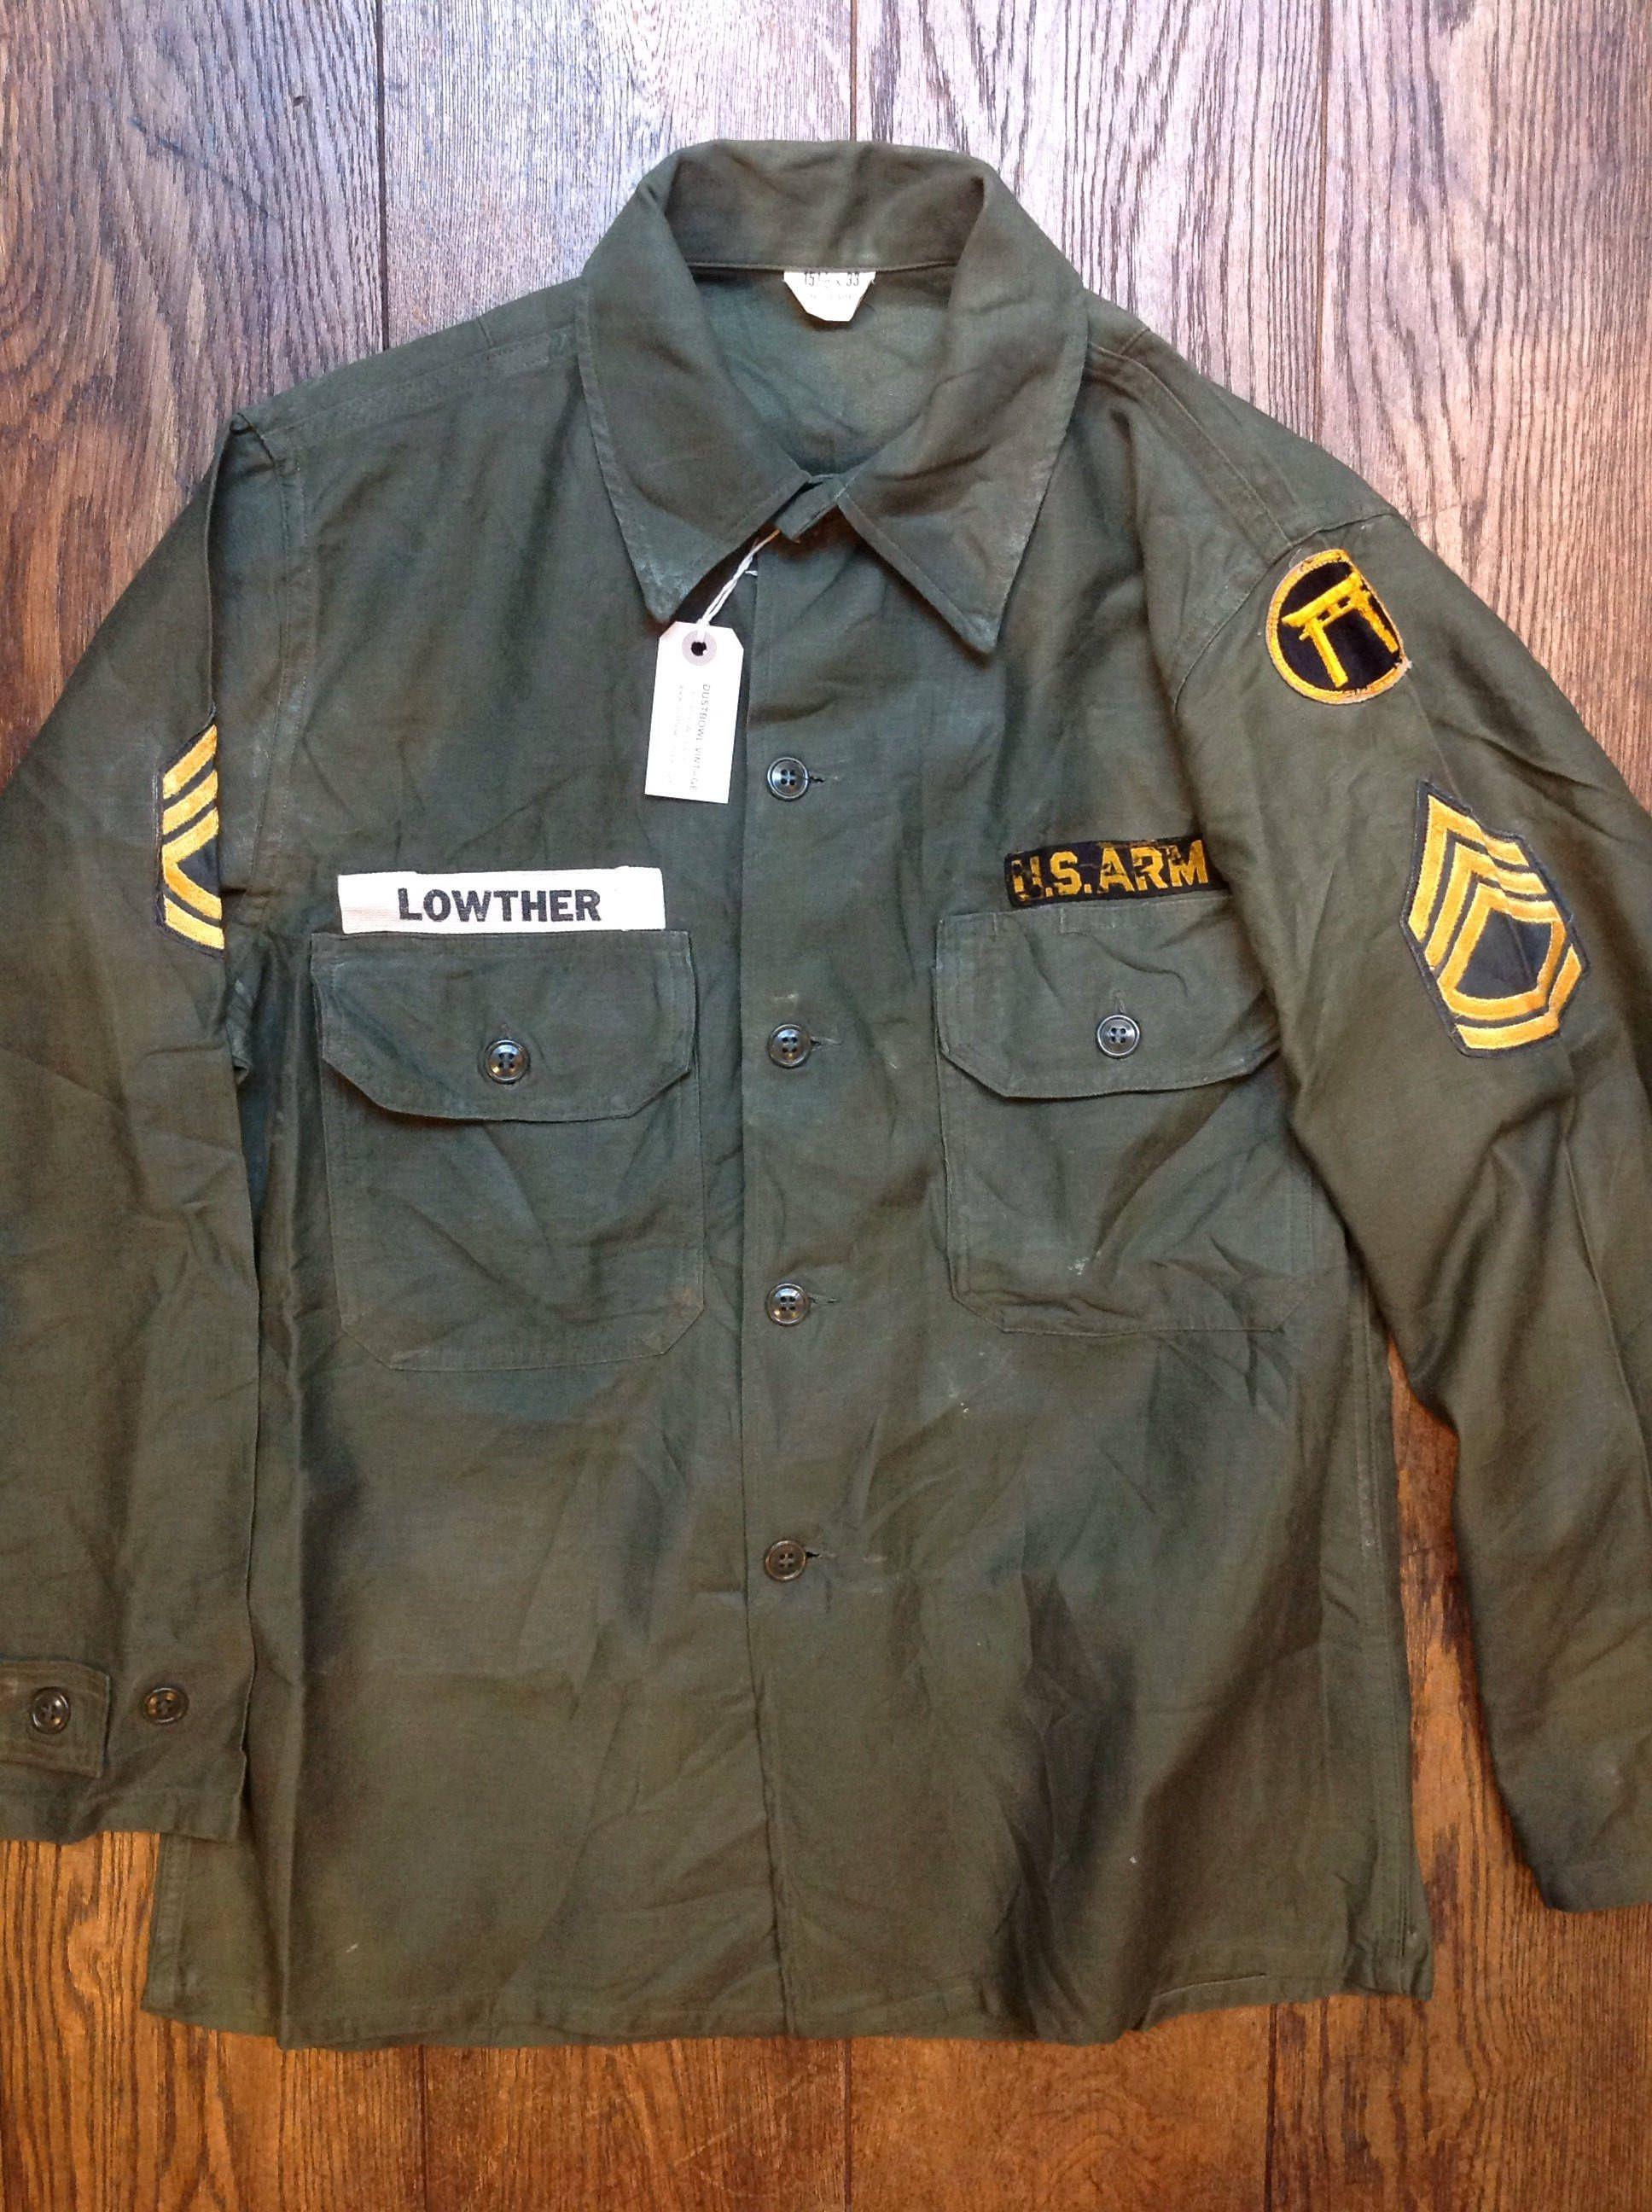 Vintage 1960s 60s khaki green sateen cotton US army utility field shirt  OG-107 46 0e50a646e